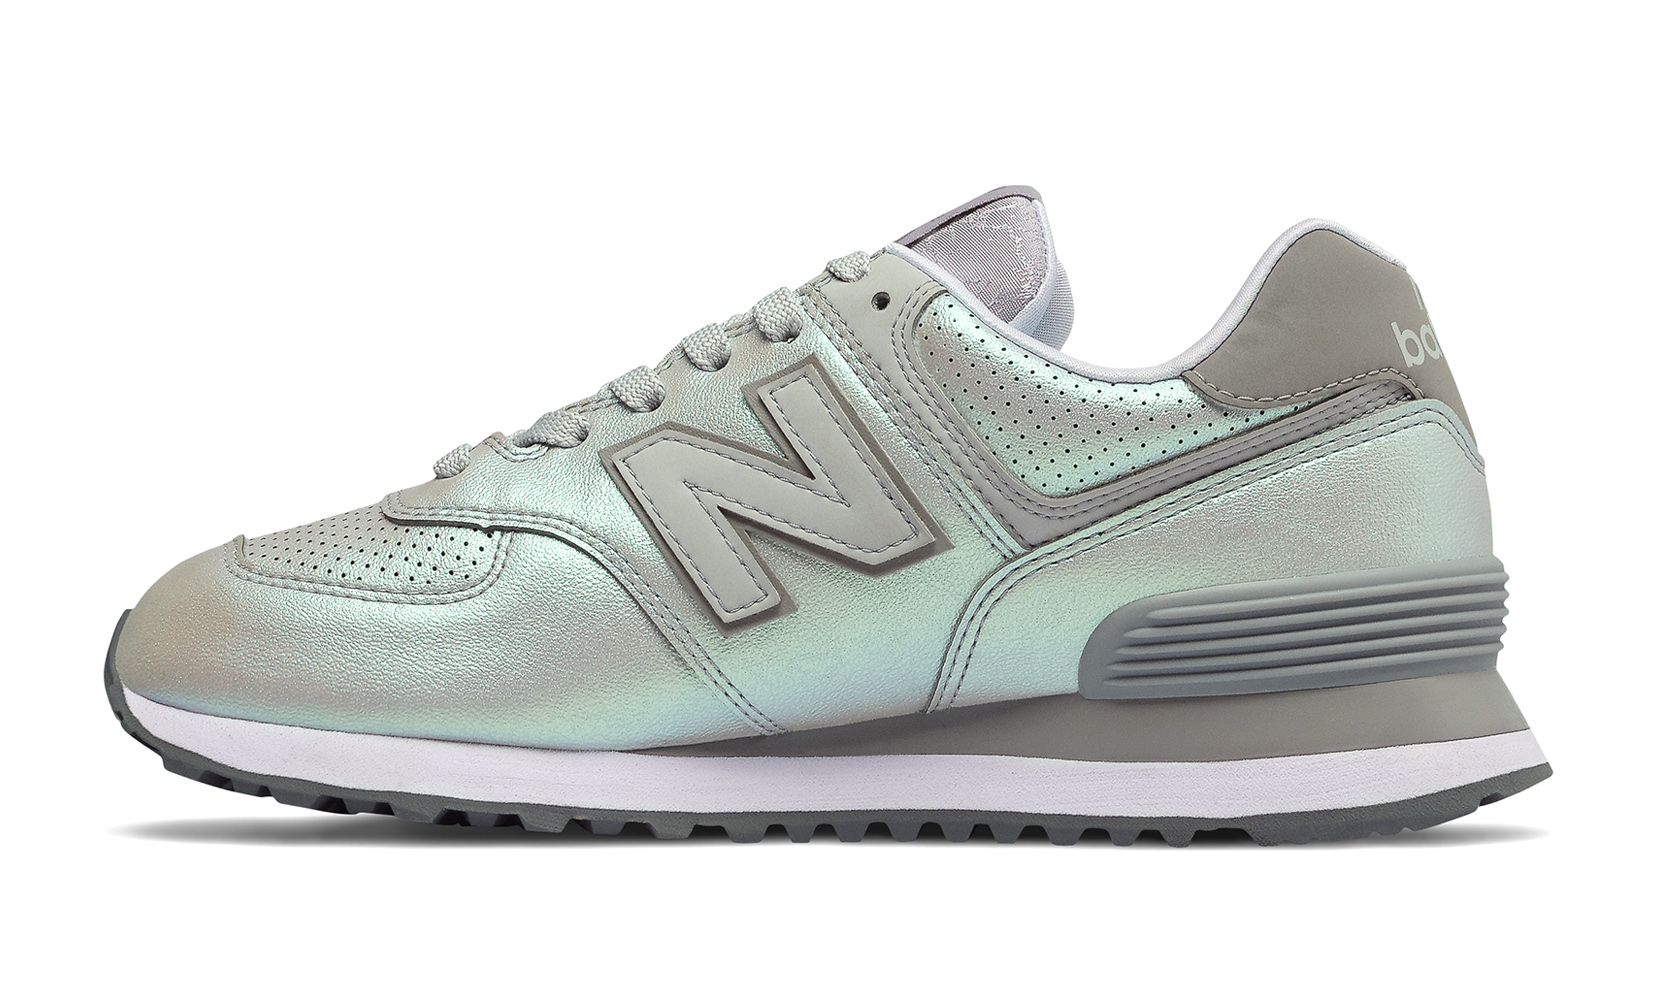 Жіноче взуття повсякденне New Balance 574 Sheen Pack WL574KSC | New Balance